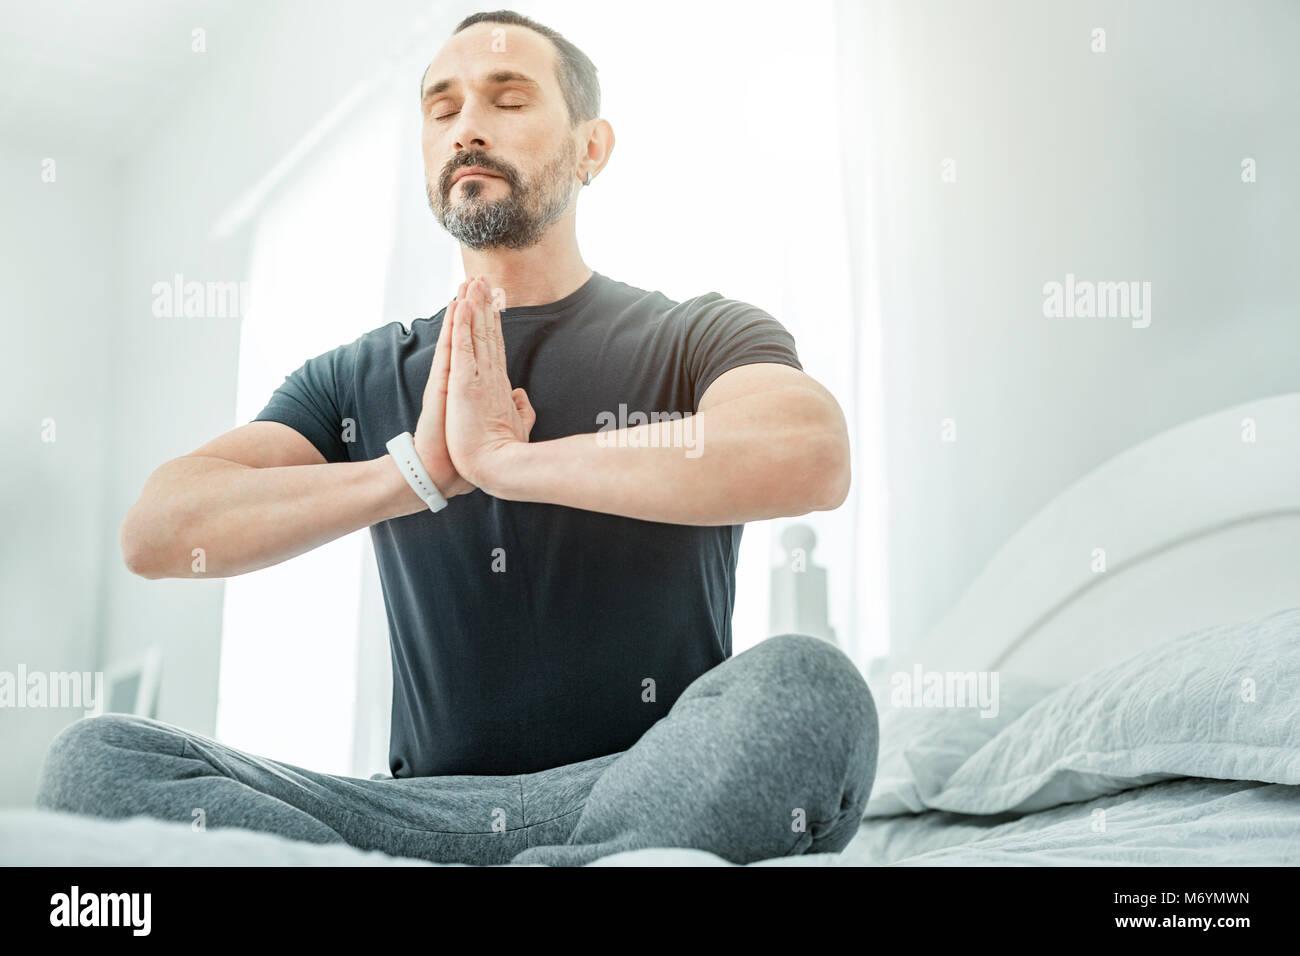 Calm healthy man sitting closing his eyes. - Stock Image